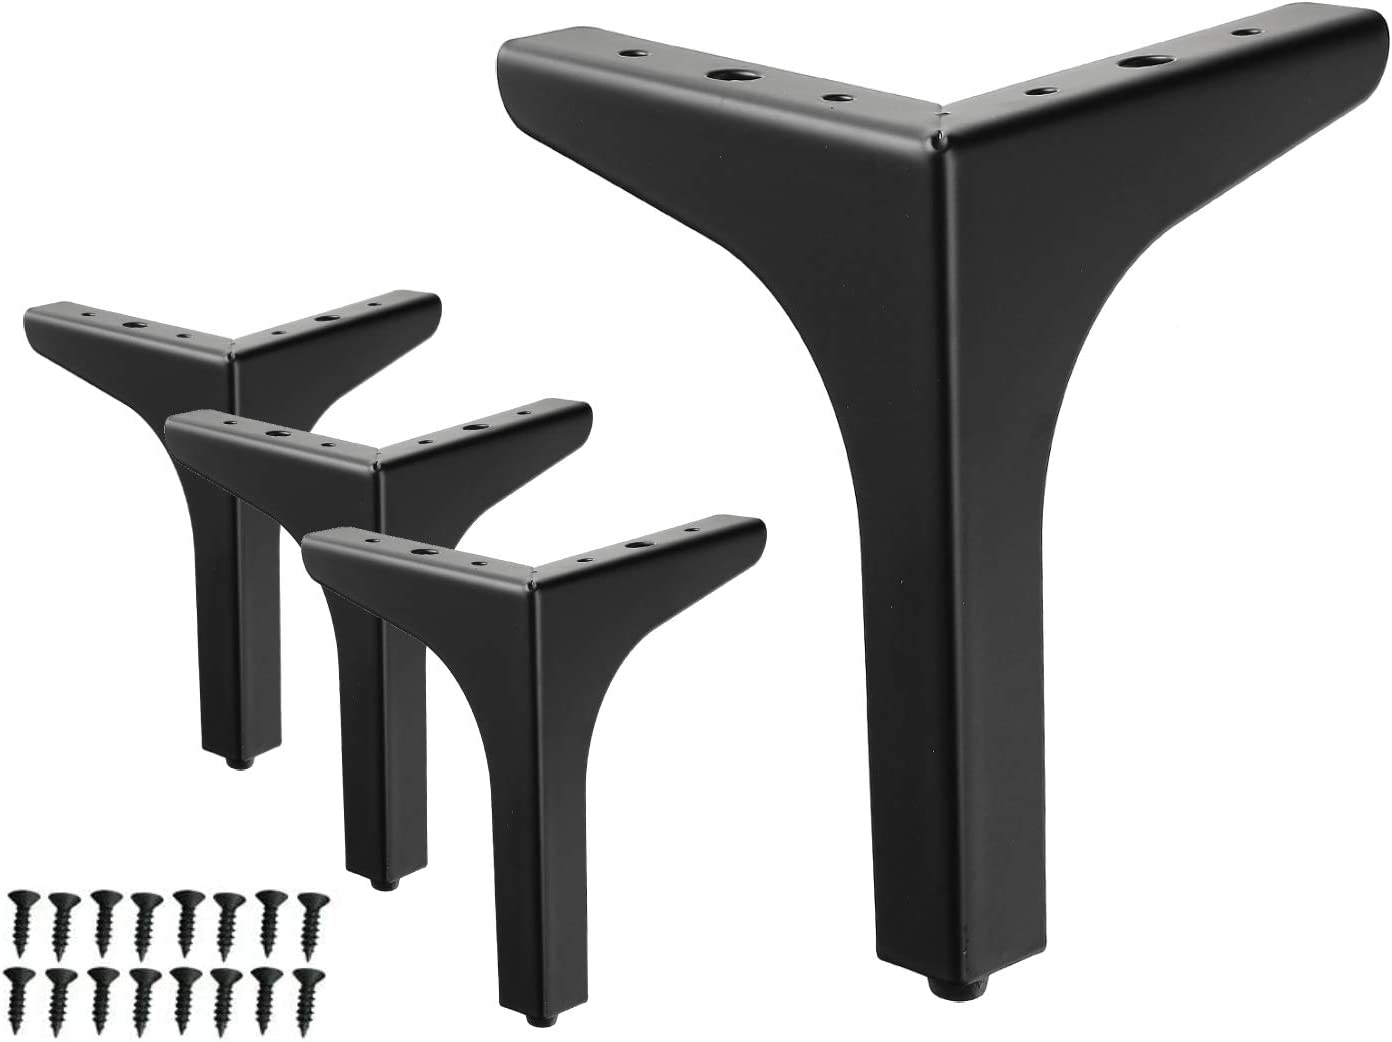 7 Max 71% OFF inch Bombing new work Metal Furniture Legs Tria Black WEICHEN Chrome